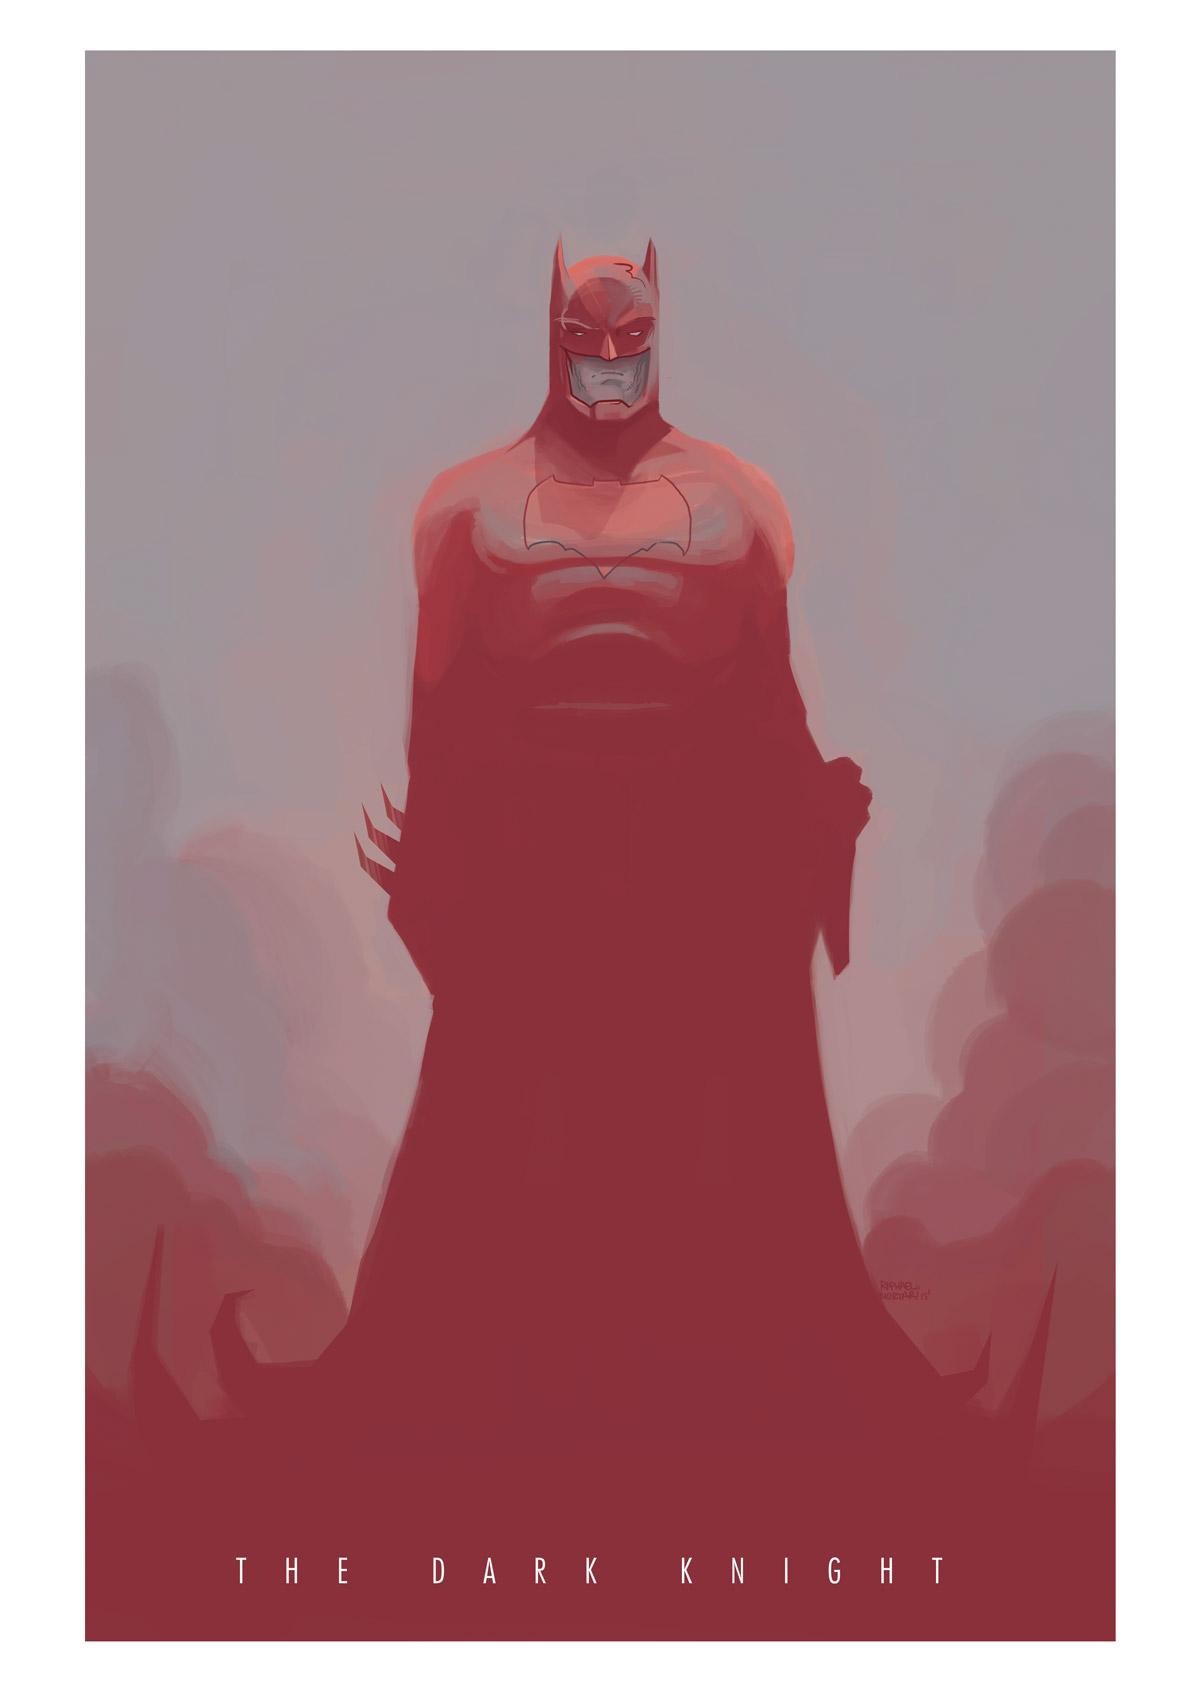 The Dark Knight on